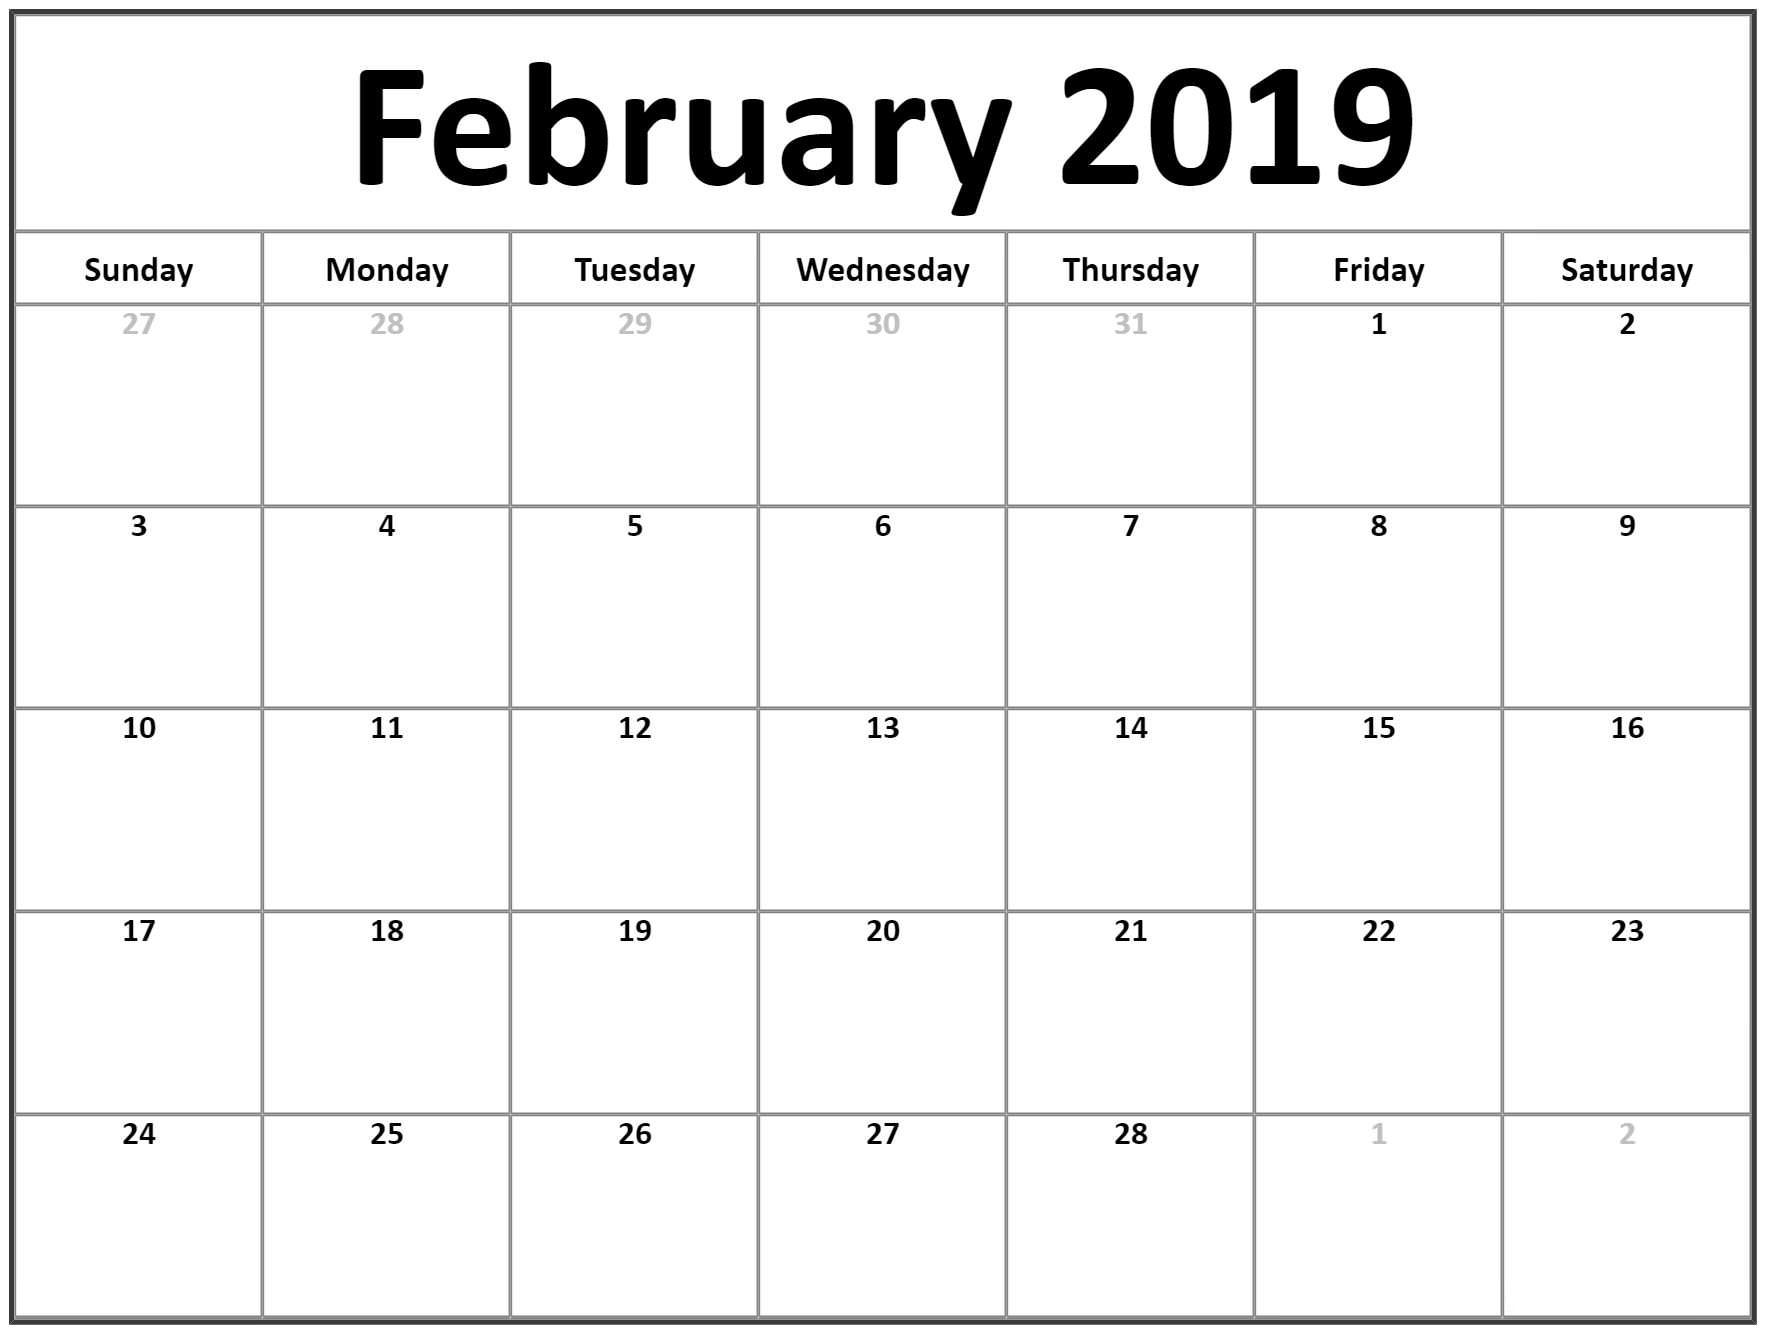 Calendar of February 2019